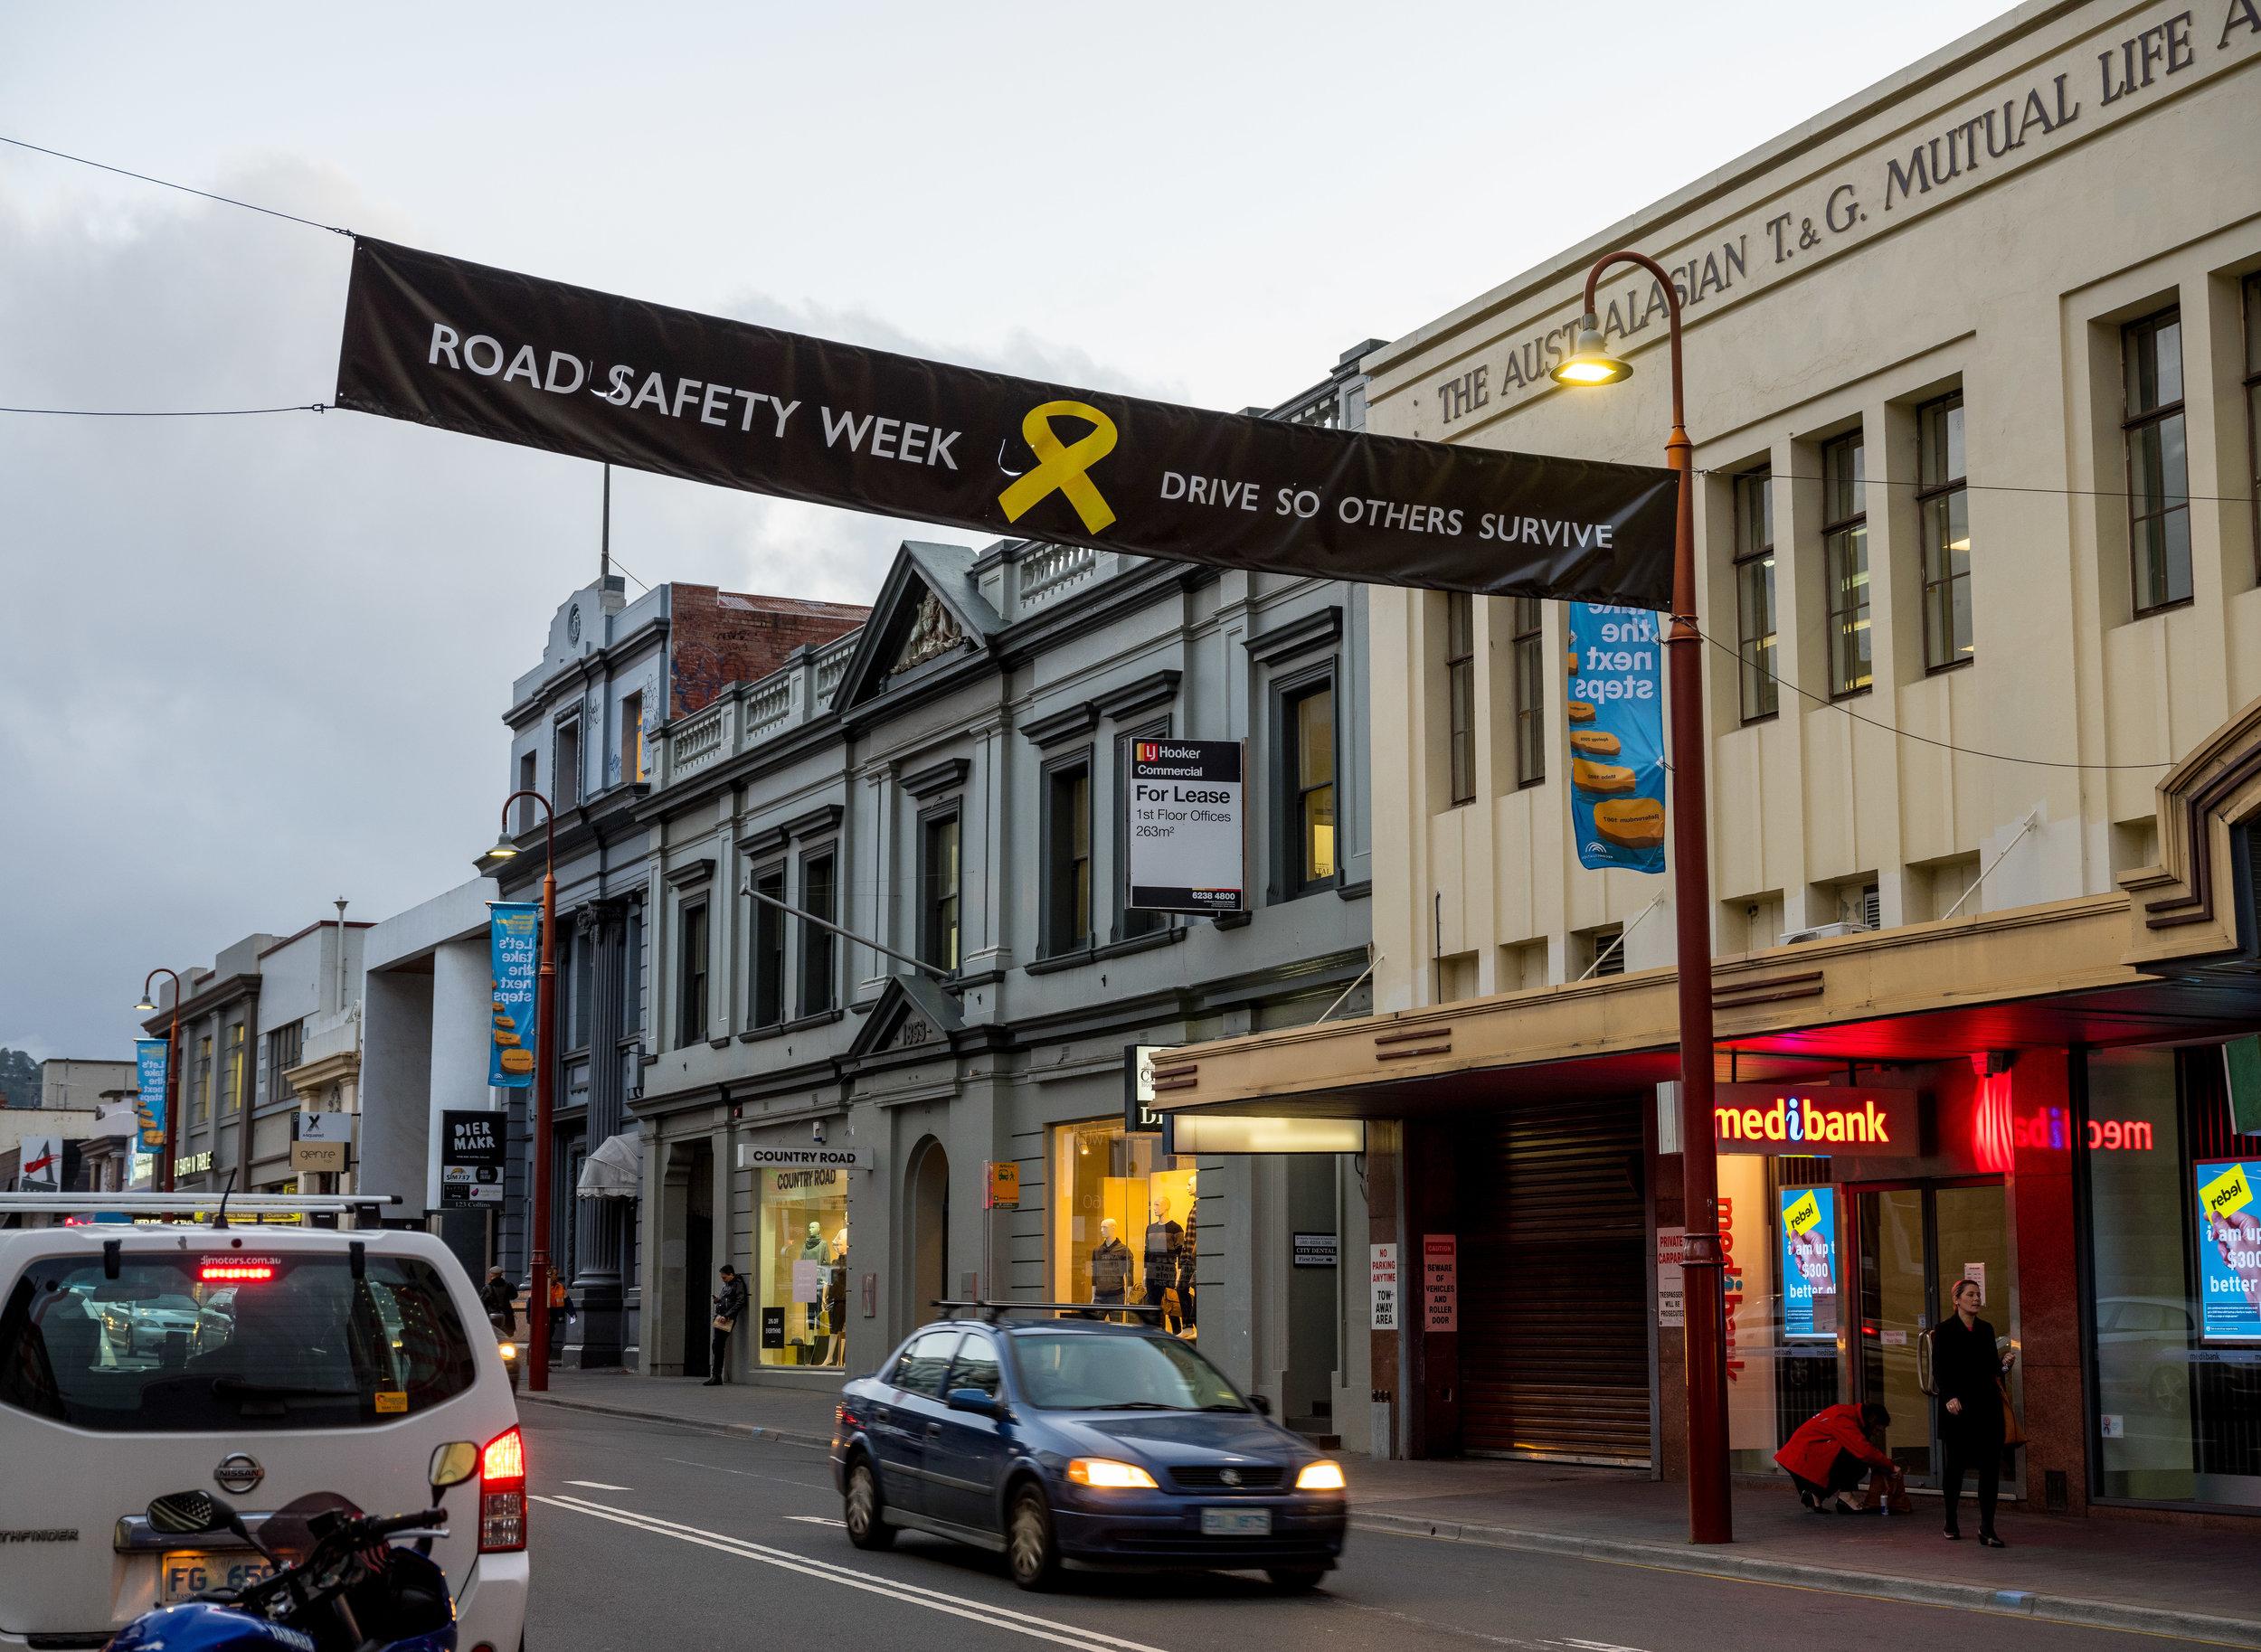 Tasmania  - Street Banner Collins Street Hobart.JPG